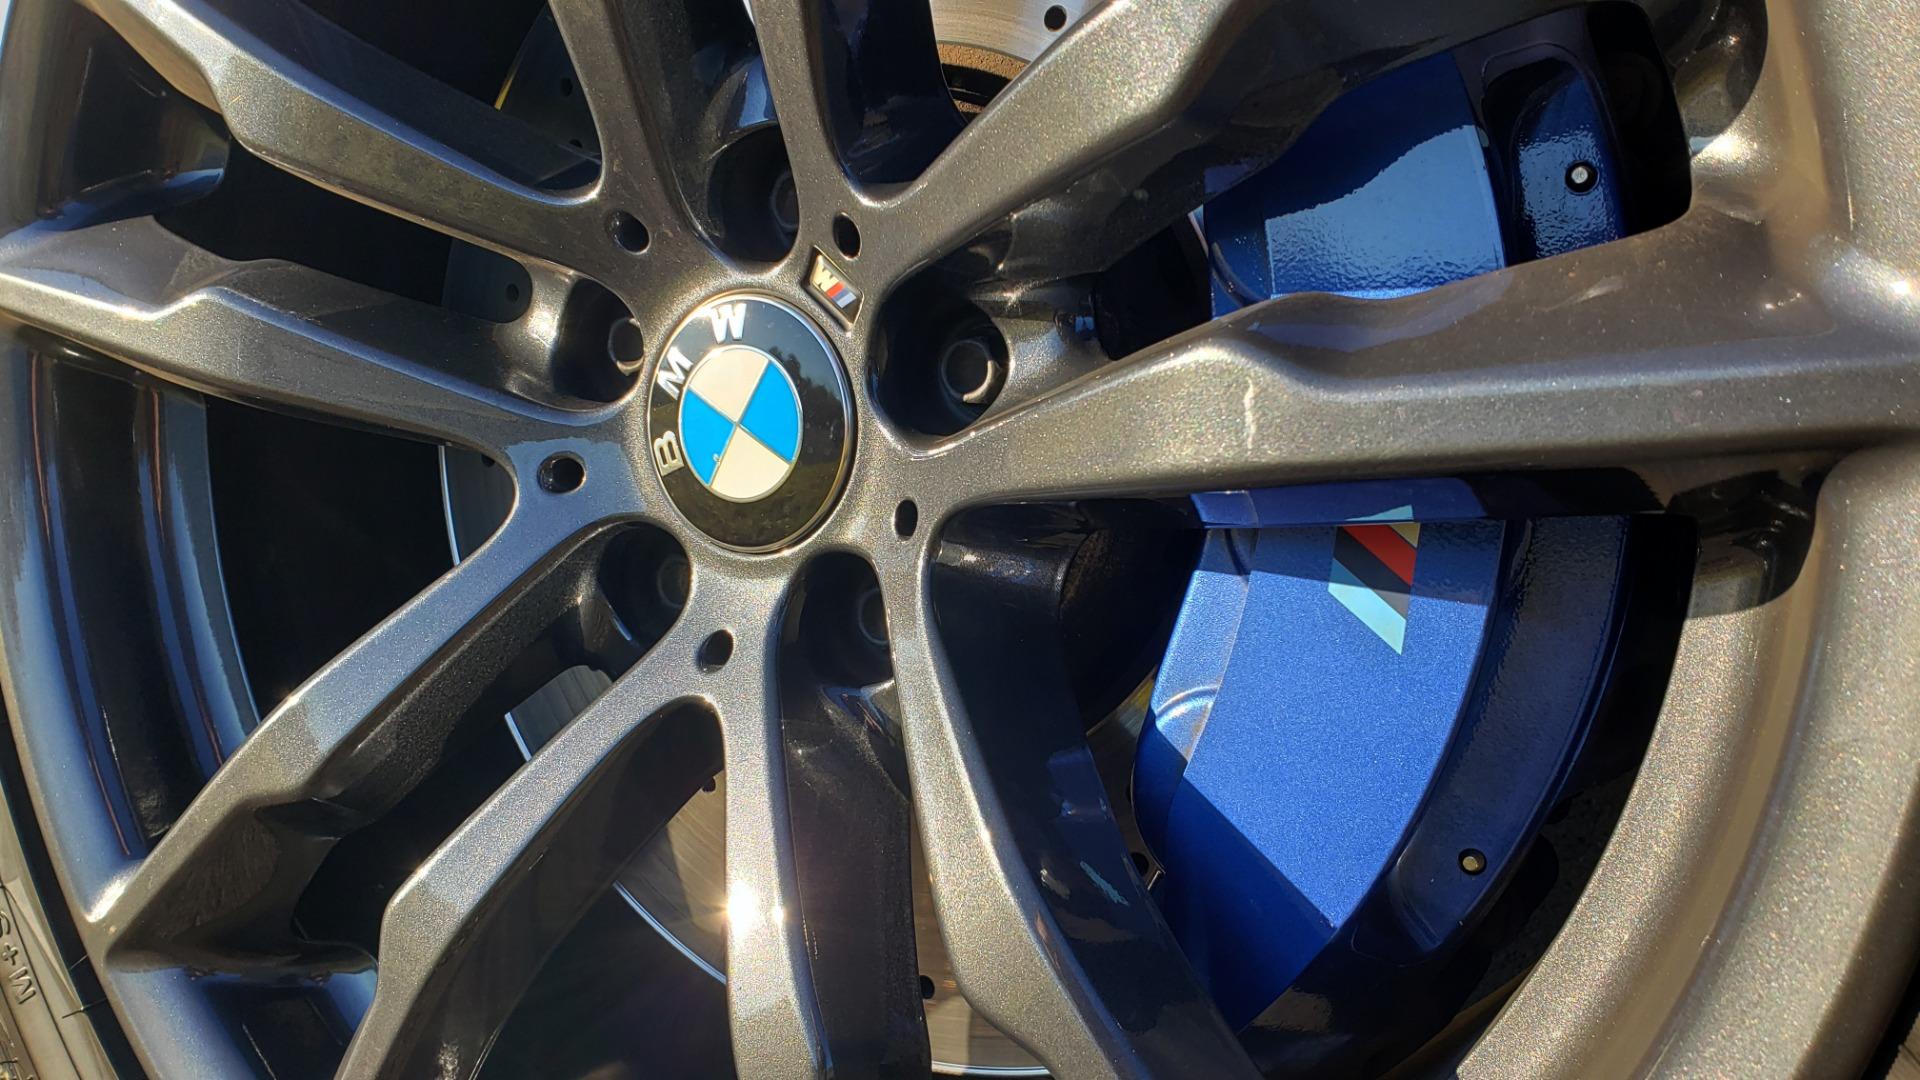 Used 2016 BMW X6 M EXEC PKG / DRVR ASST / NAV / SUNROOF / BLIND SPOT / REARVIEW for sale Sold at Formula Imports in Charlotte NC 28227 95